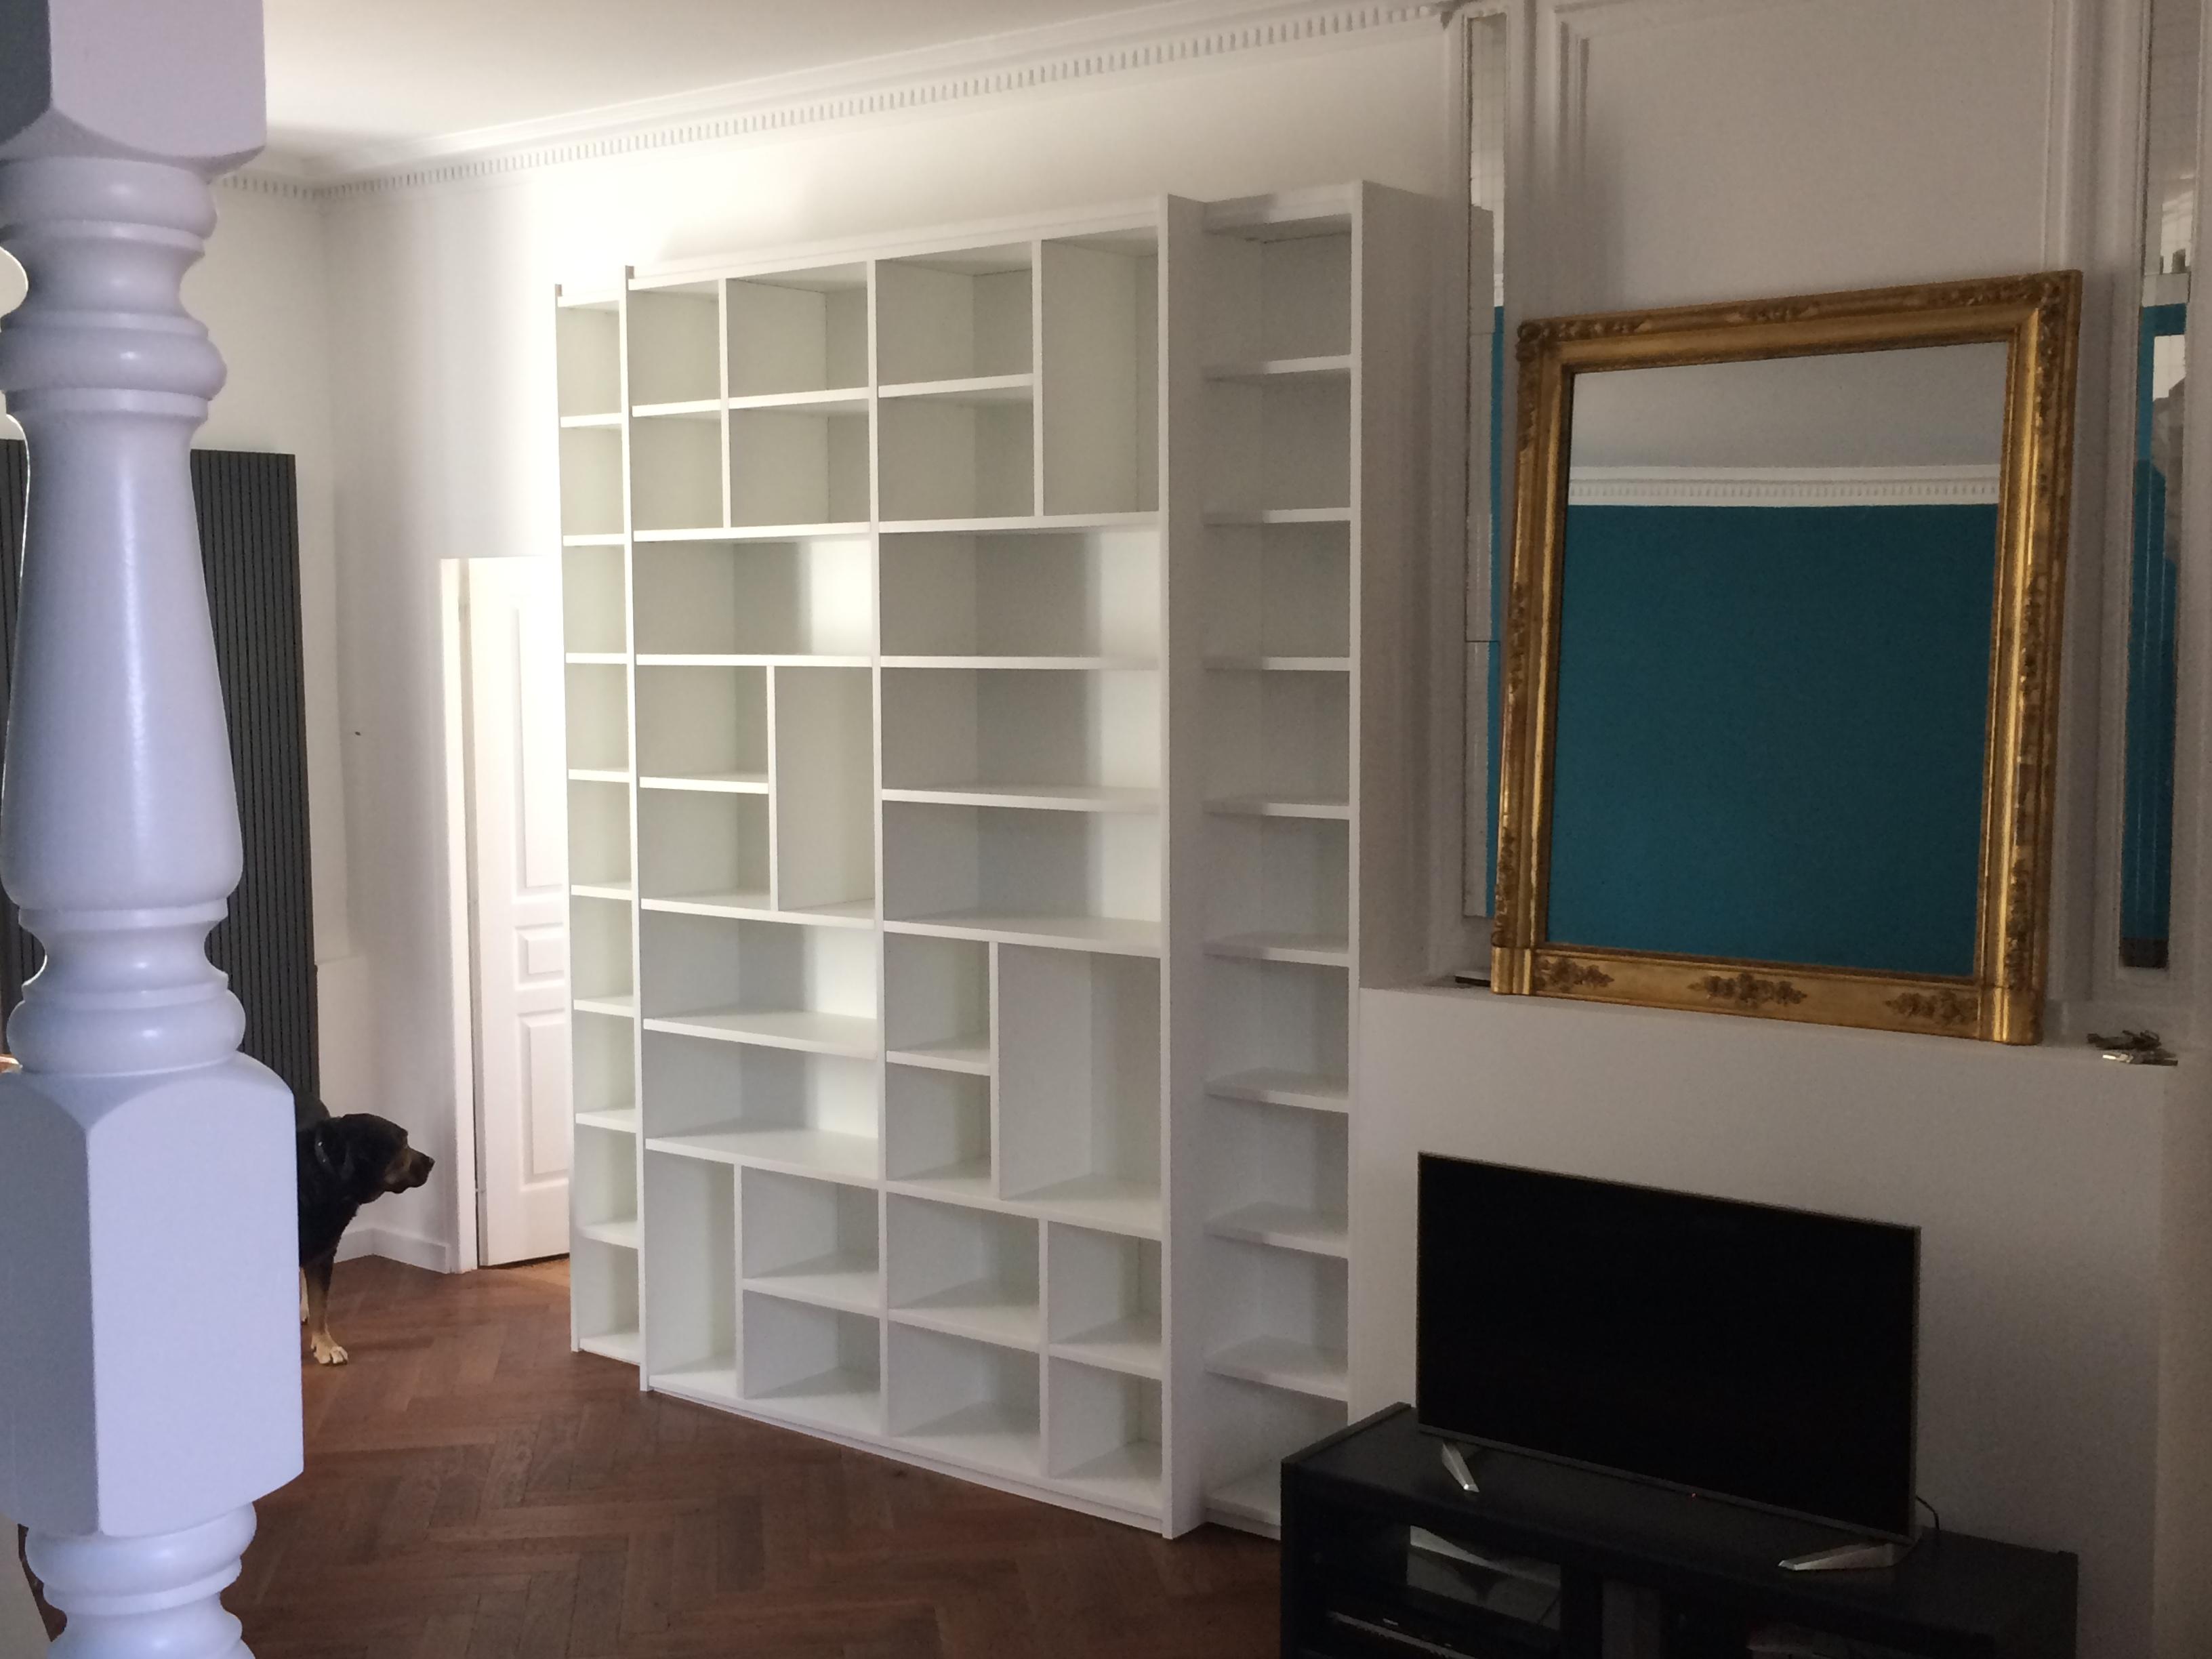 biblioth que 10 dresscode nantes. Black Bedroom Furniture Sets. Home Design Ideas